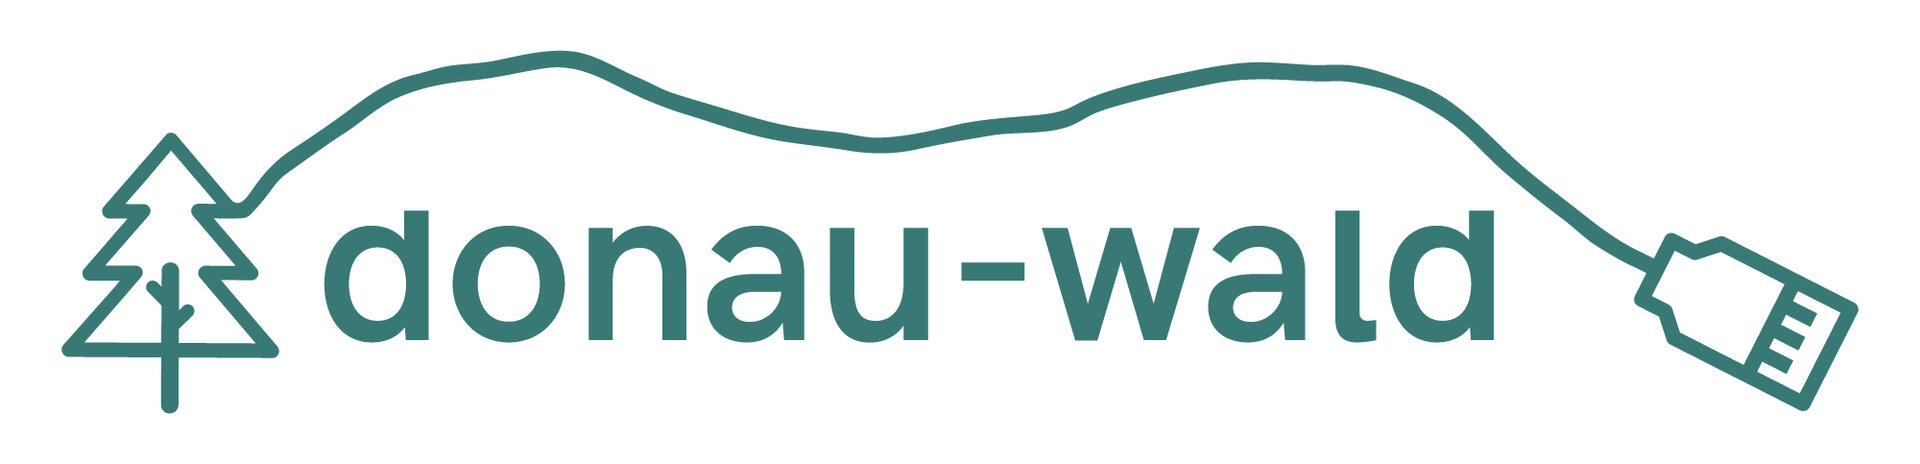 donau-wald-Logo-RGB-DunkelT_rkis